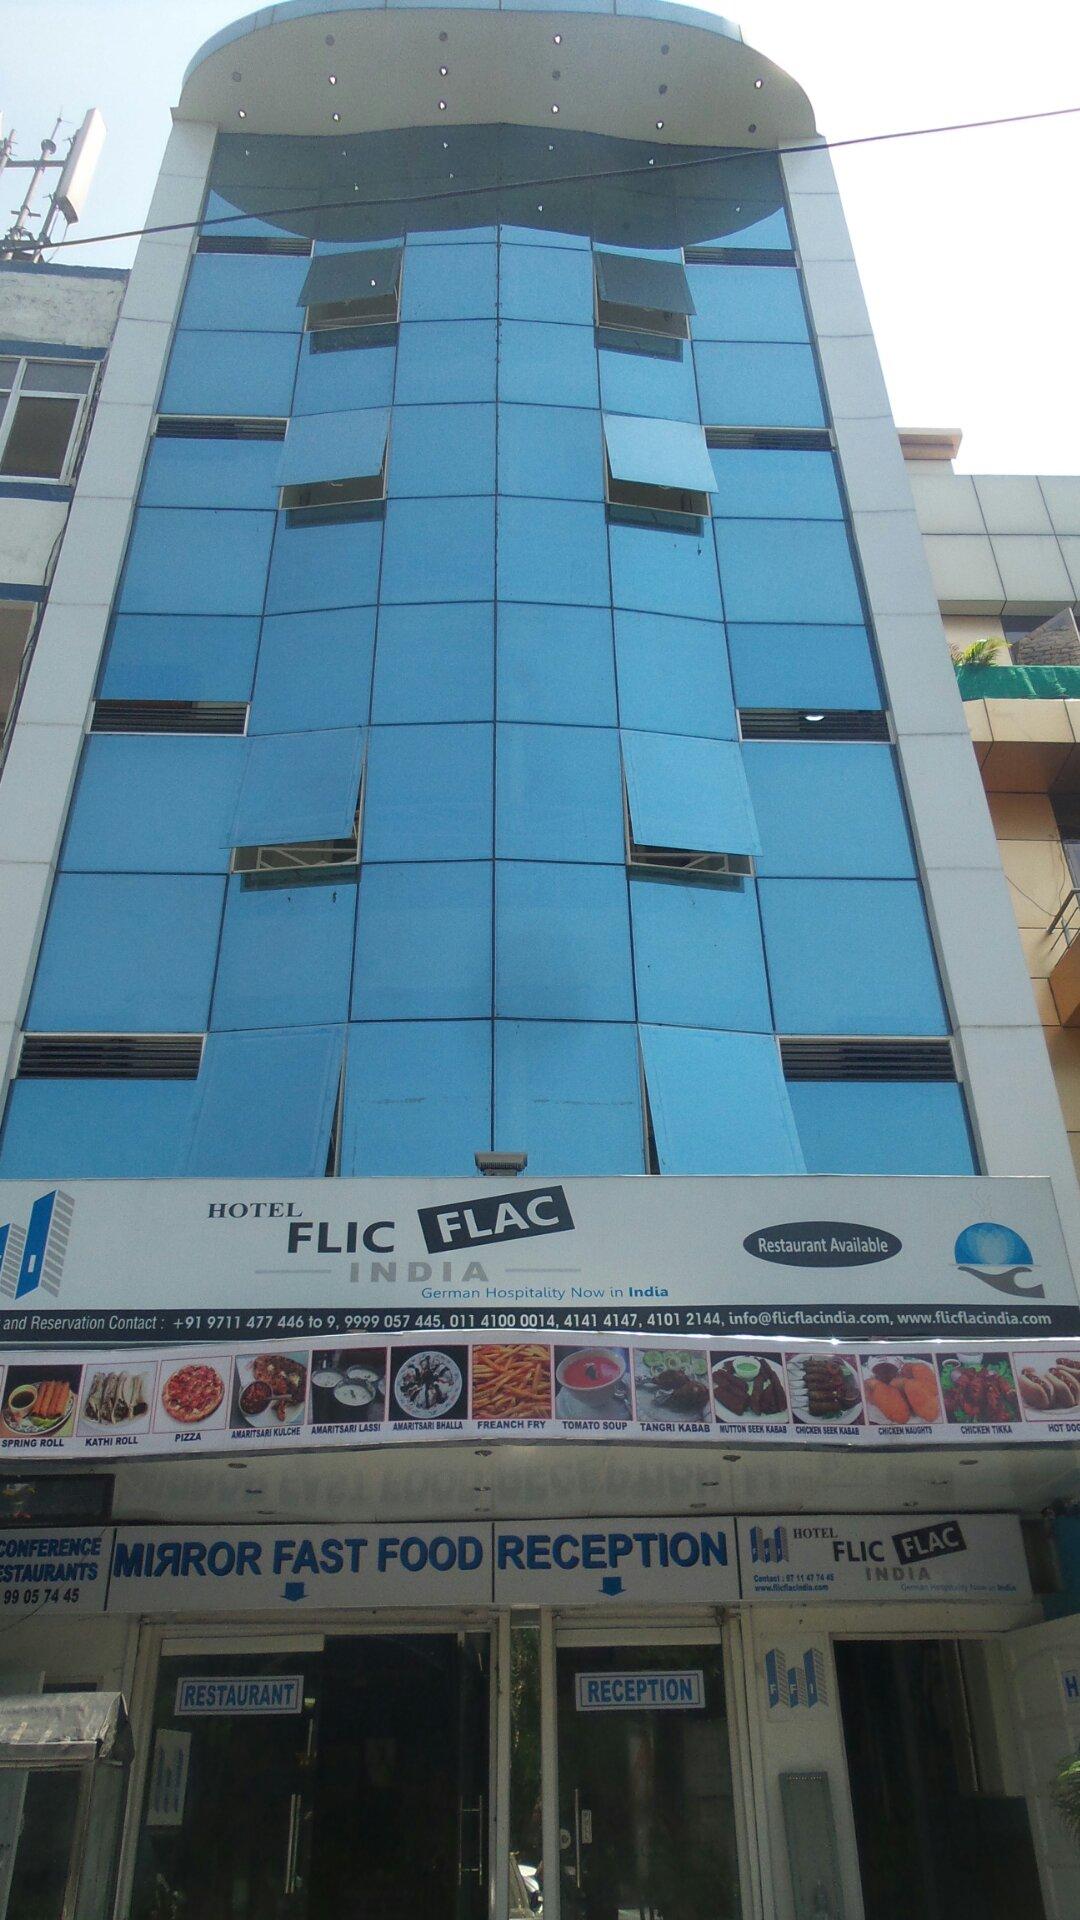 Hotel Flic Flac India in New Delhi